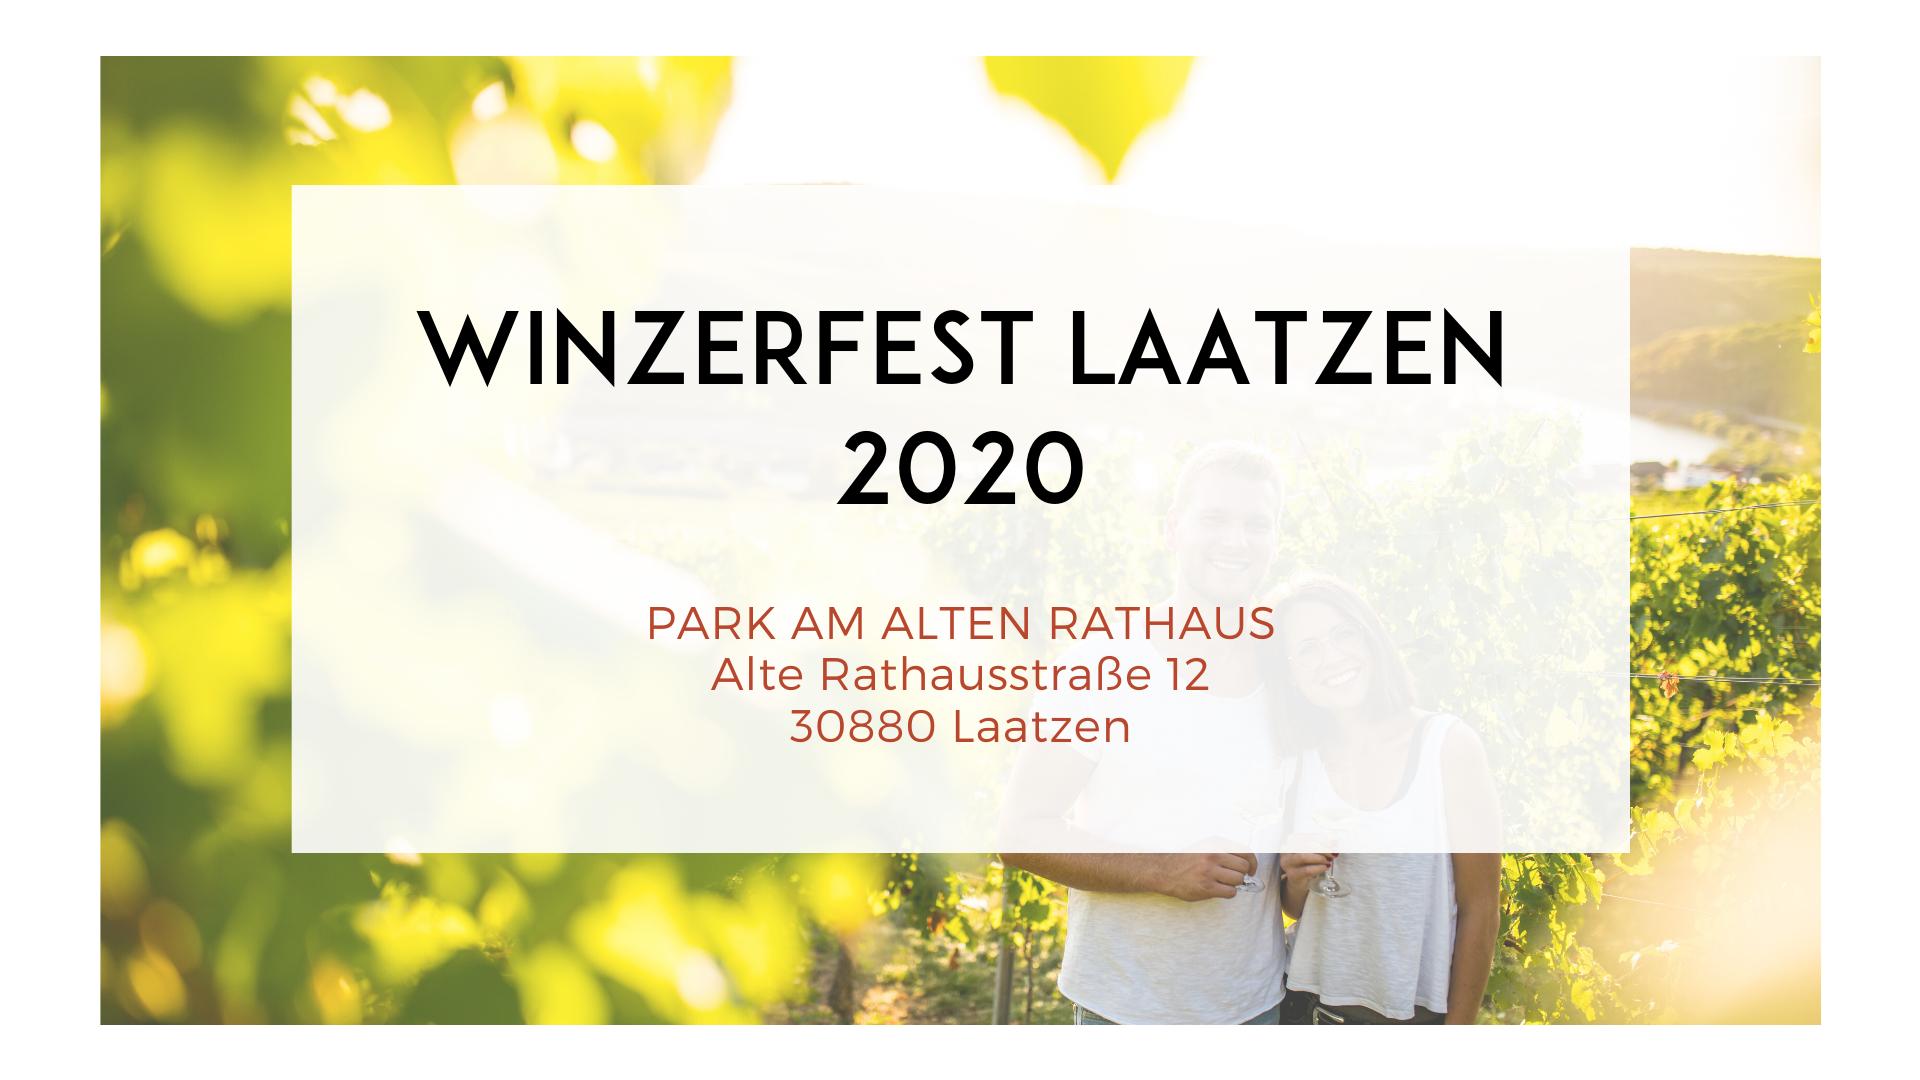 WINZERFEST LAATZEN 2020